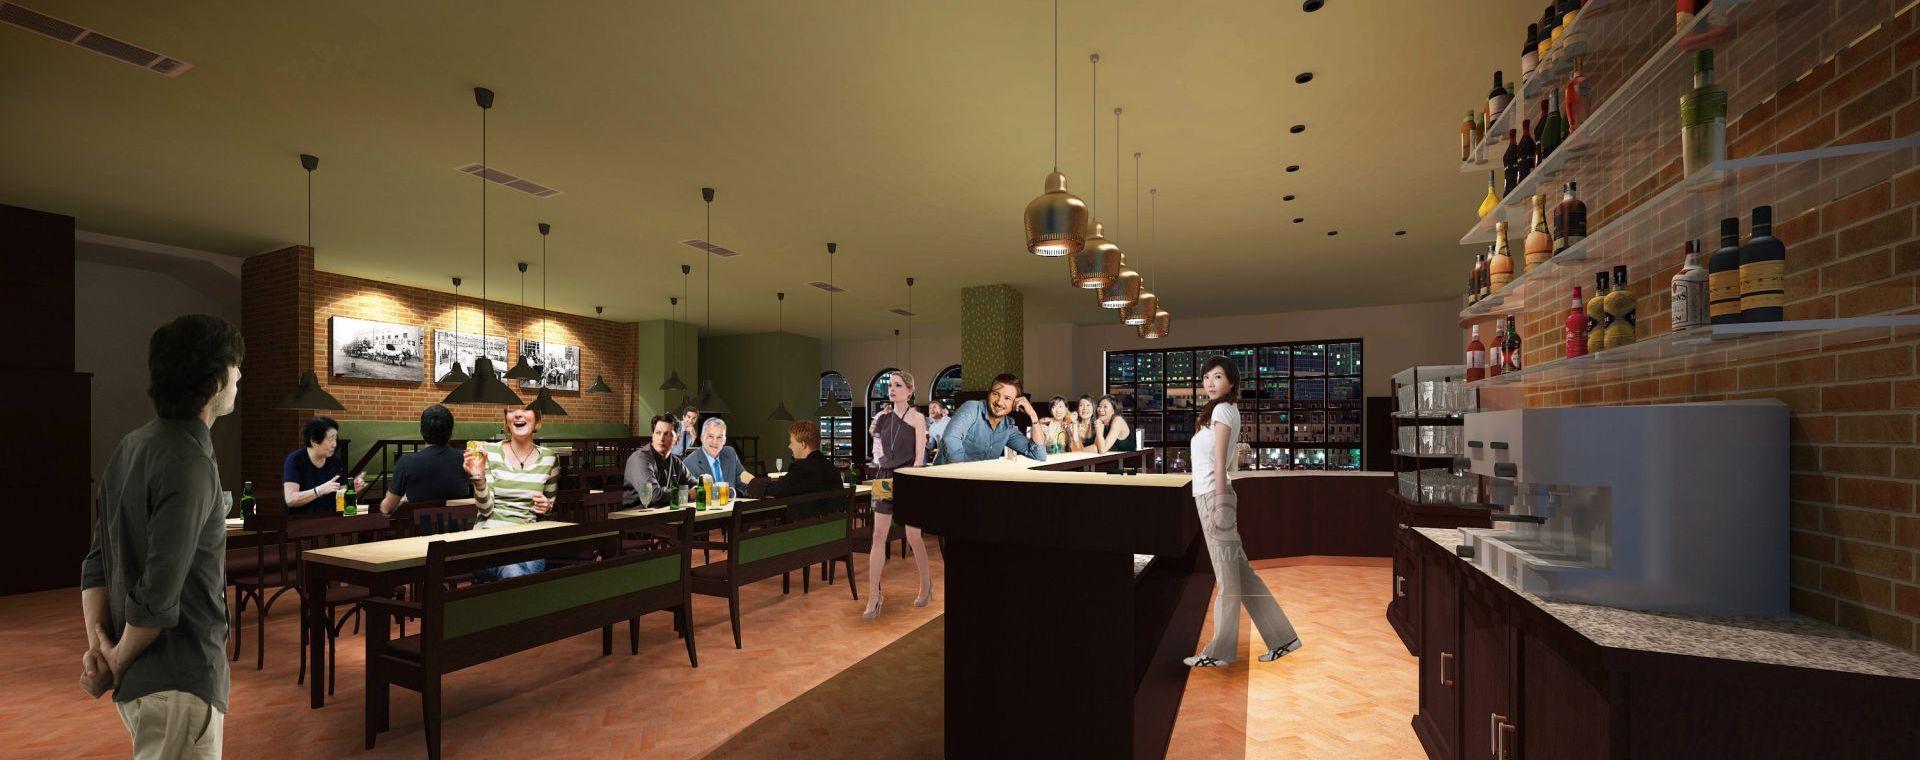 Czech pub in Beiijing, 2013, Beiijing, CHN - cooperation